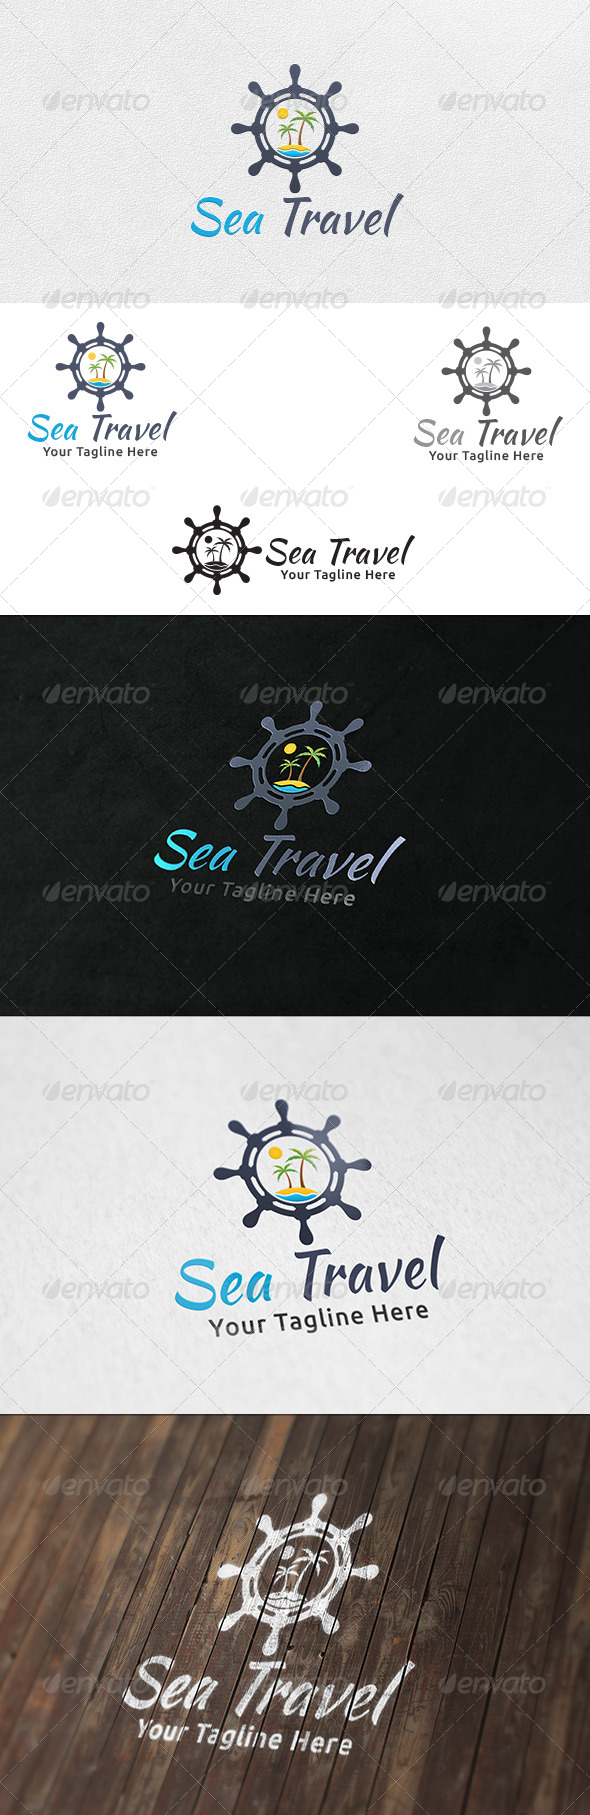 Sea Travel - Logo Tempate - Objects Logo Templates